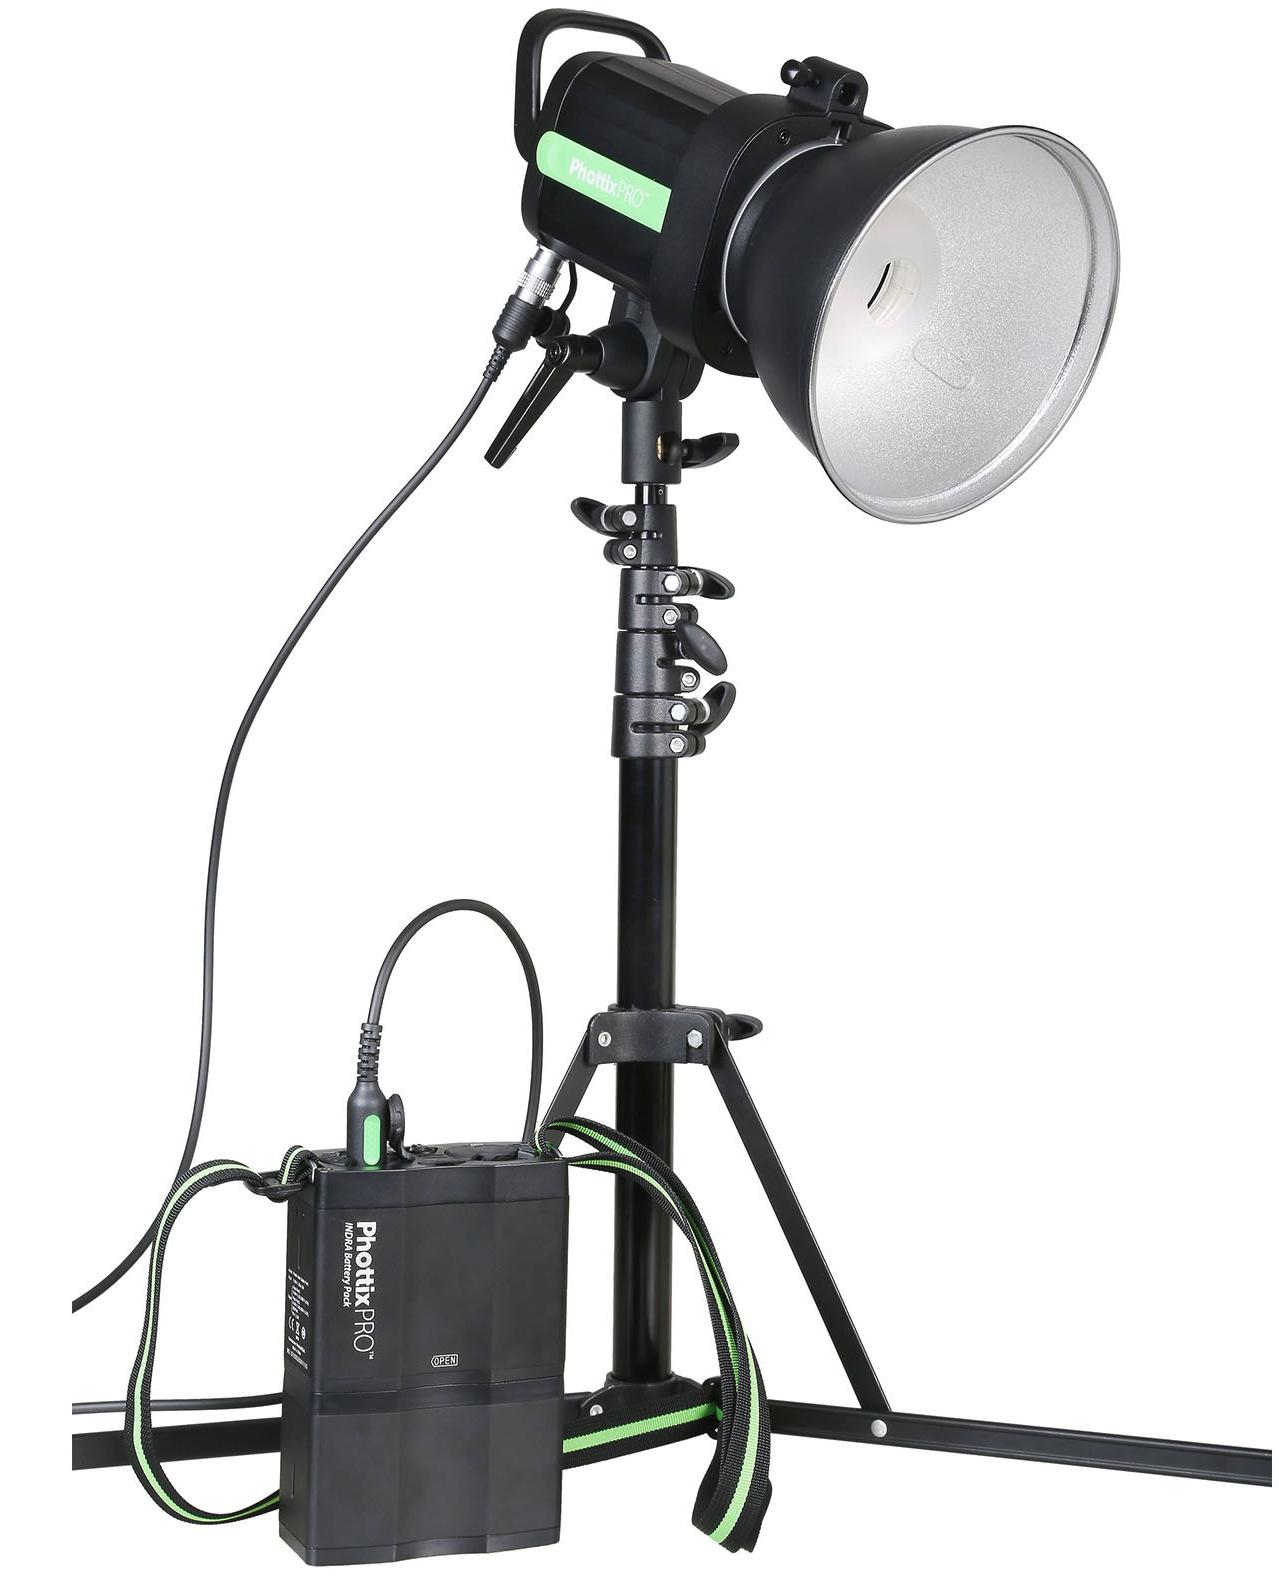 Phottix is starting 2015 off with the Phottix Indra500 TTL Studio ...